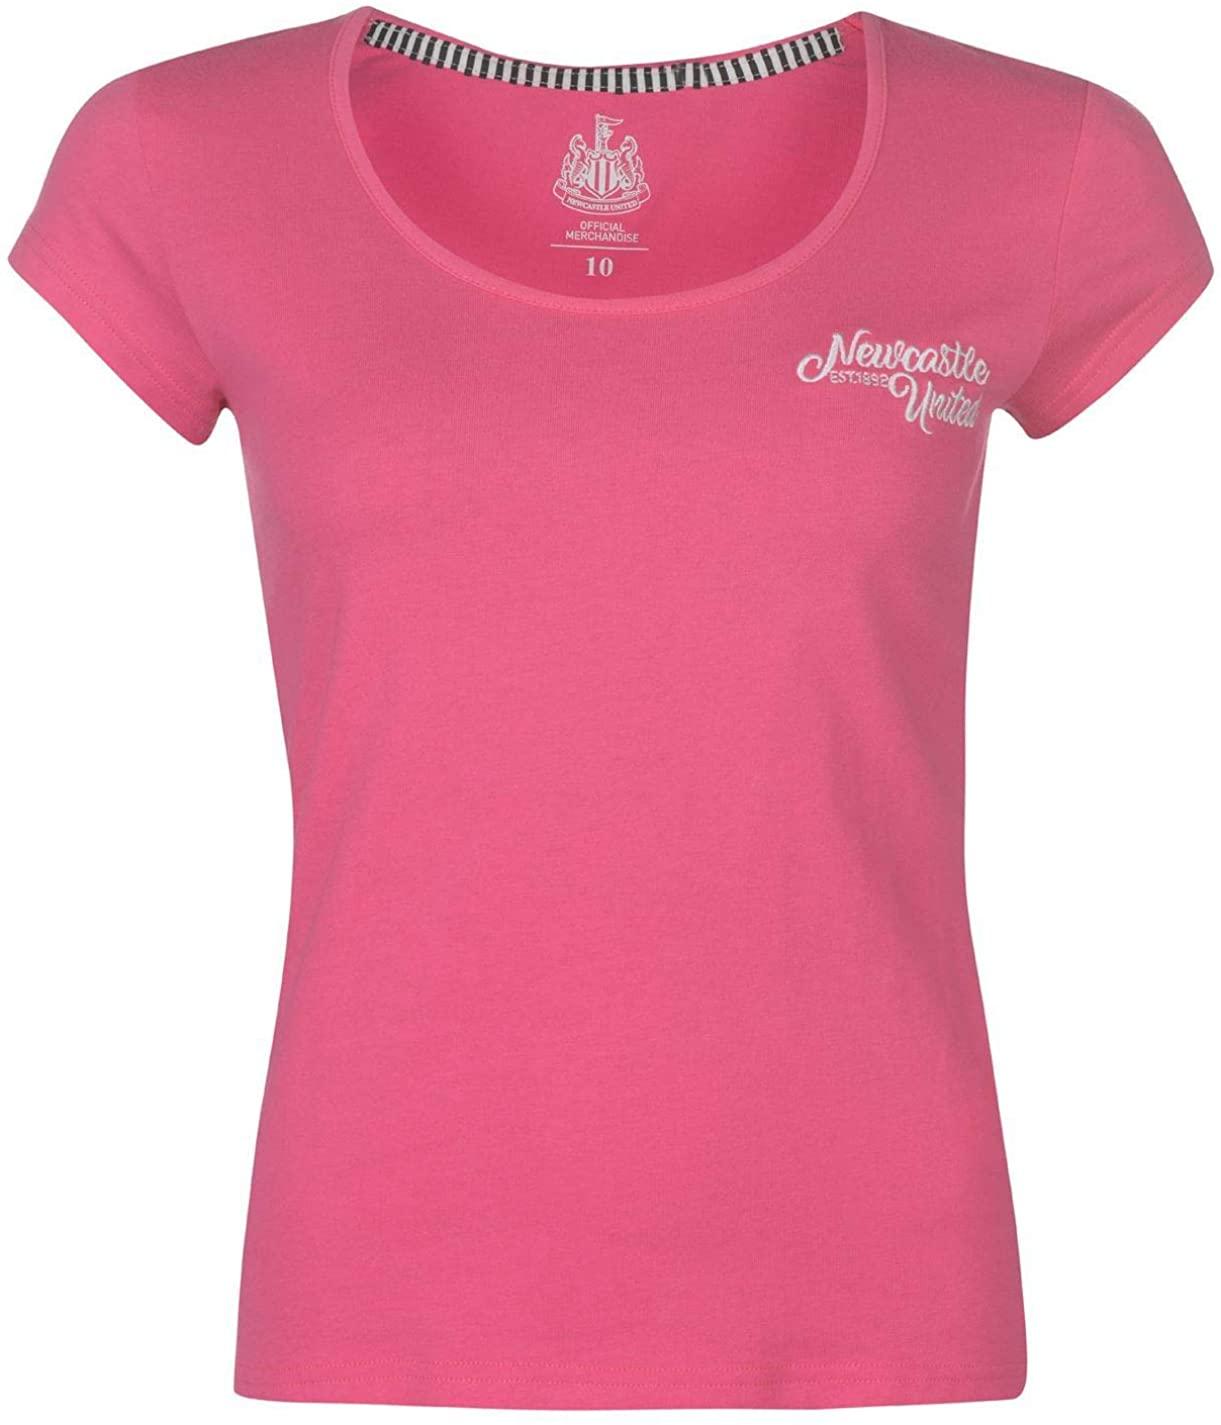 NUFC Newcastle United Script T-Shirt Womens Football Soccer Fan Top Tee Shirt Pink UK 8 (X-Small)